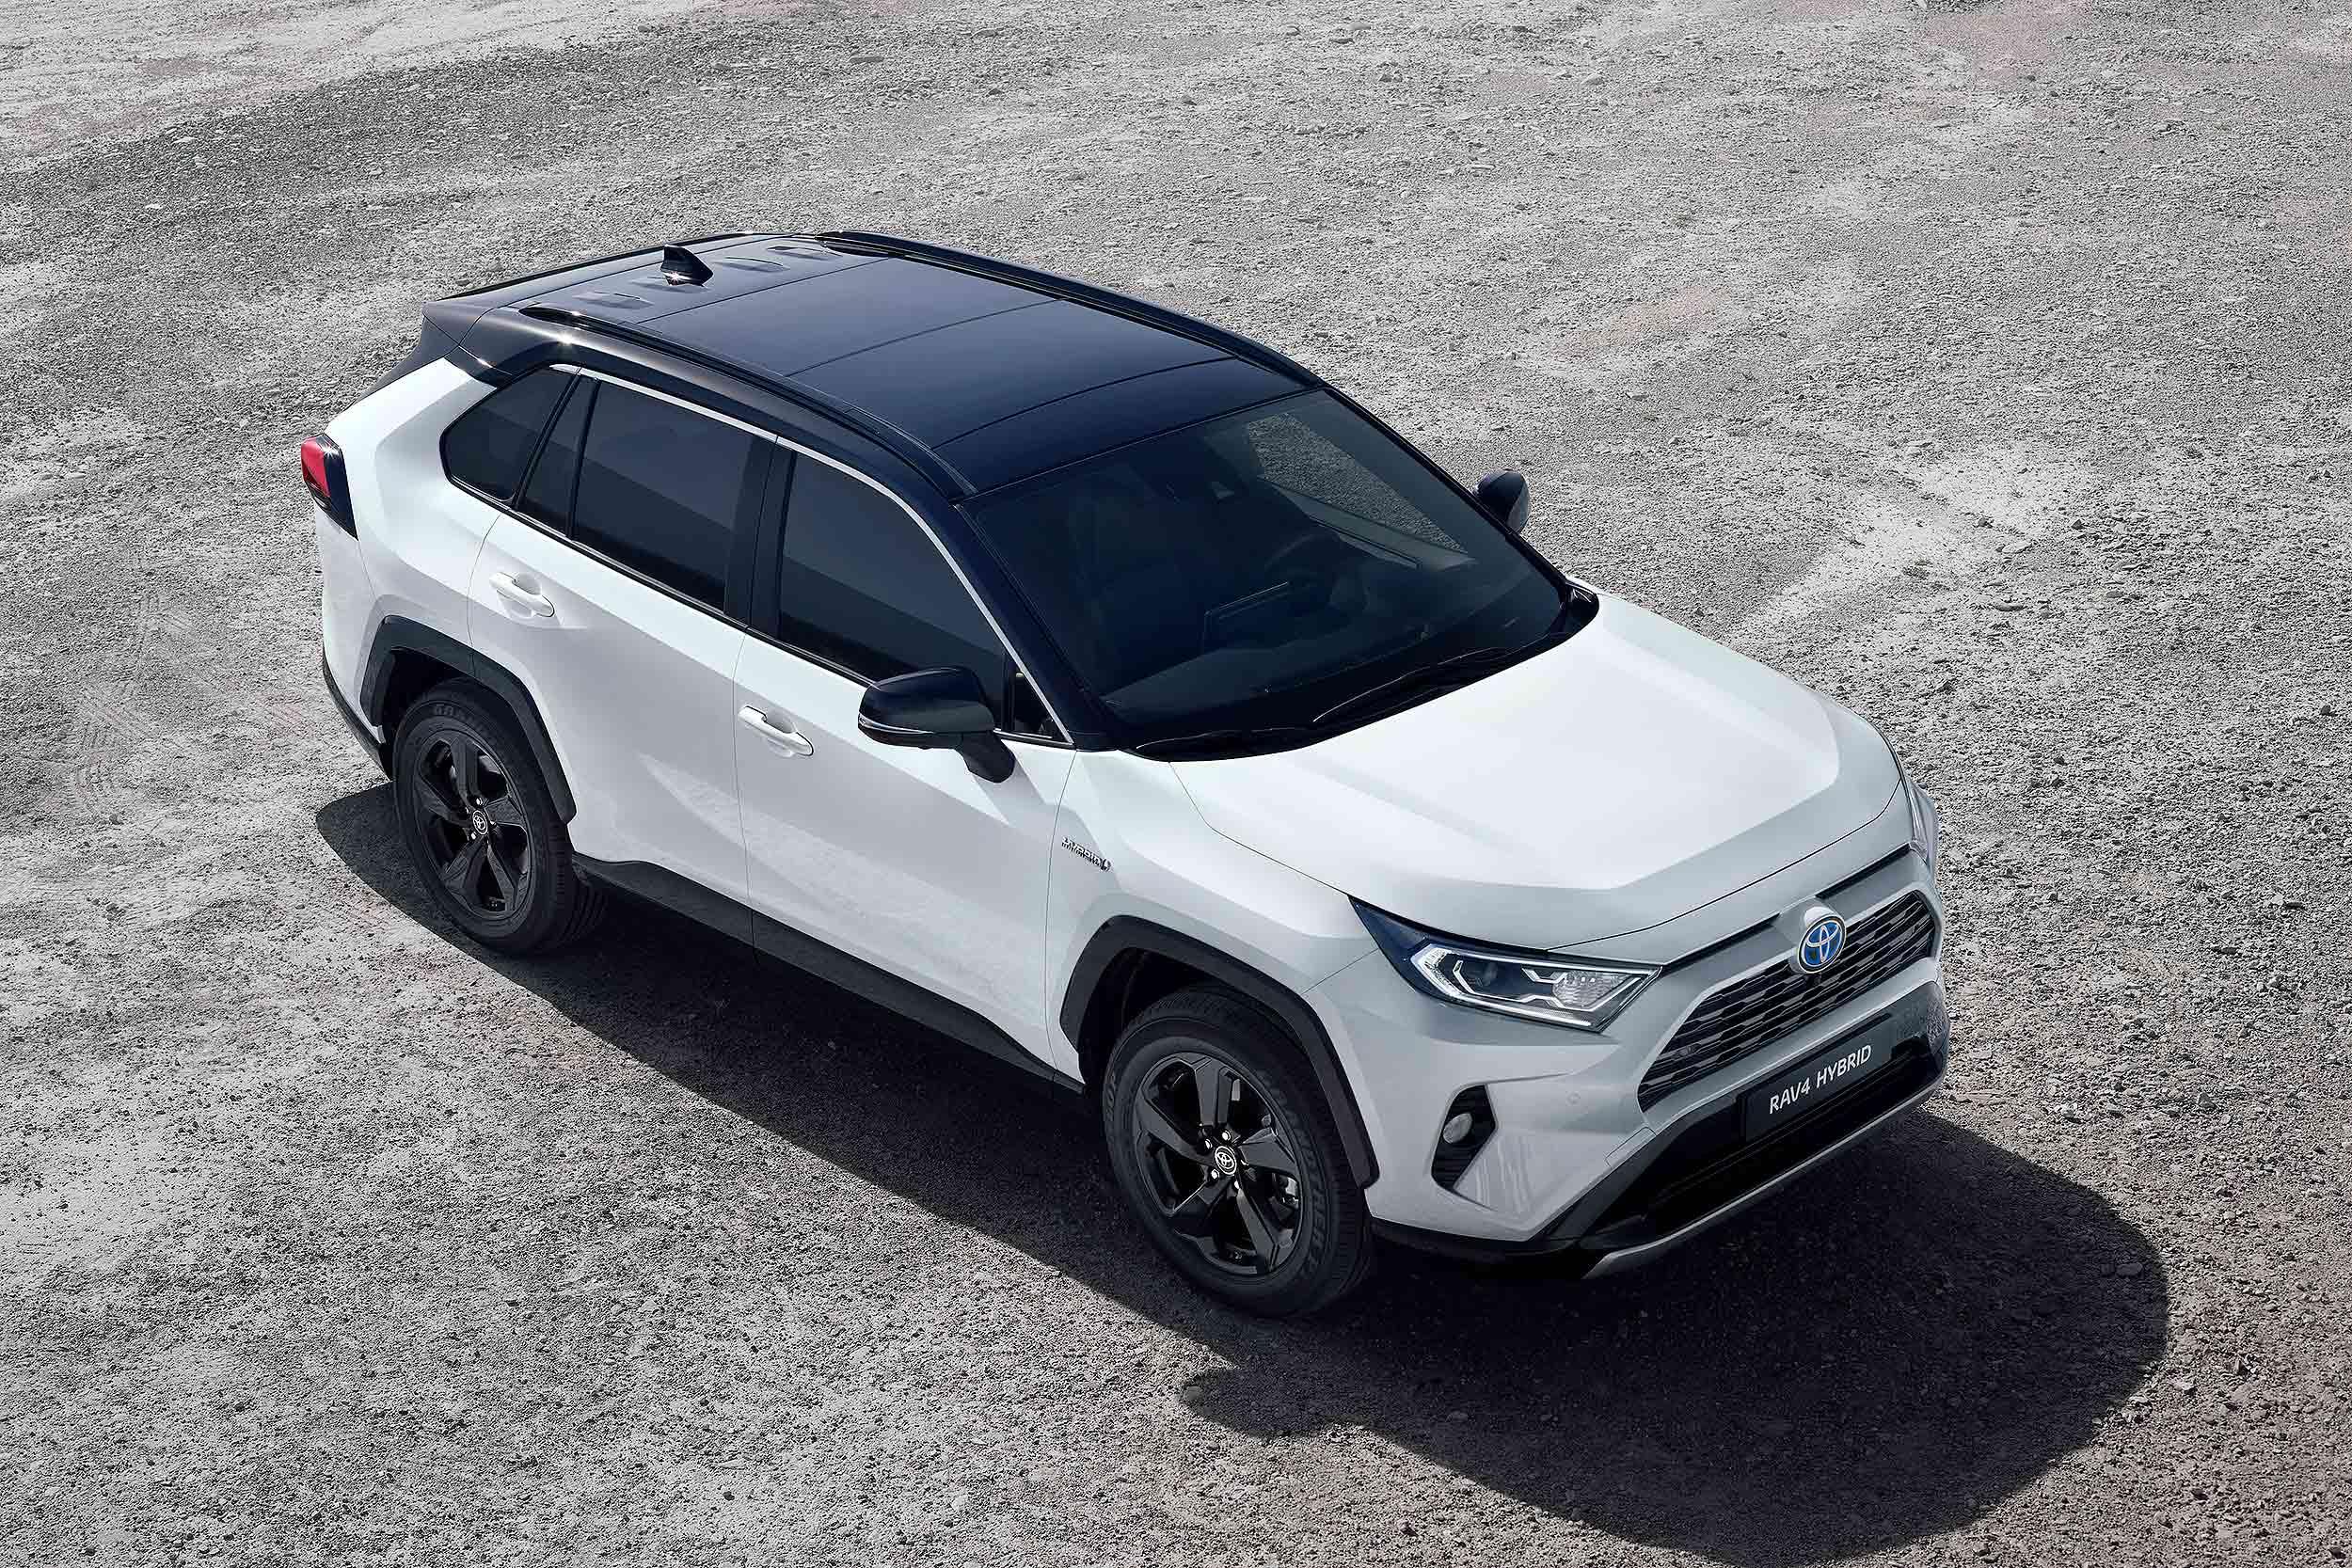 73 All New Best Toyota 2019 Rav4 Specs Price Configurations for Best Toyota 2019 Rav4 Specs Price